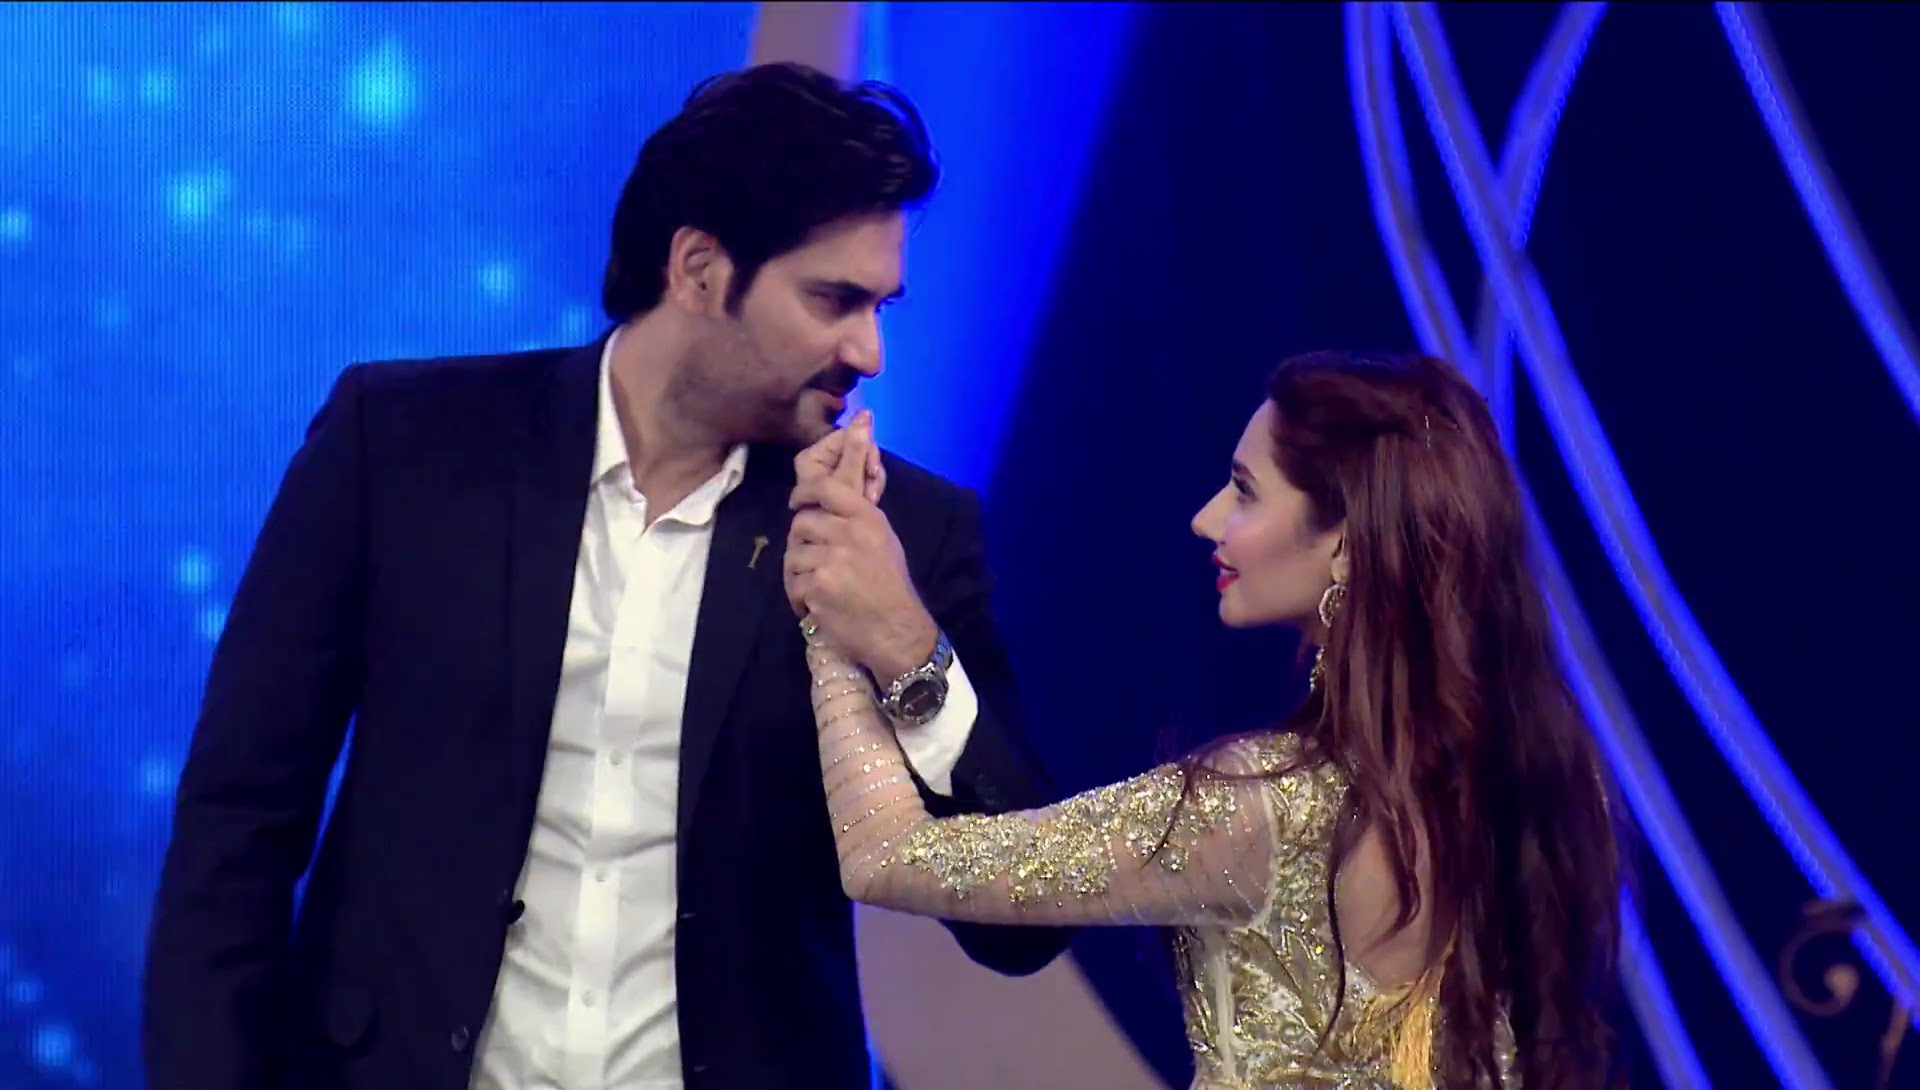 Lux Style Awards 2016: Mahira Khan & Humayun Saeed Performance